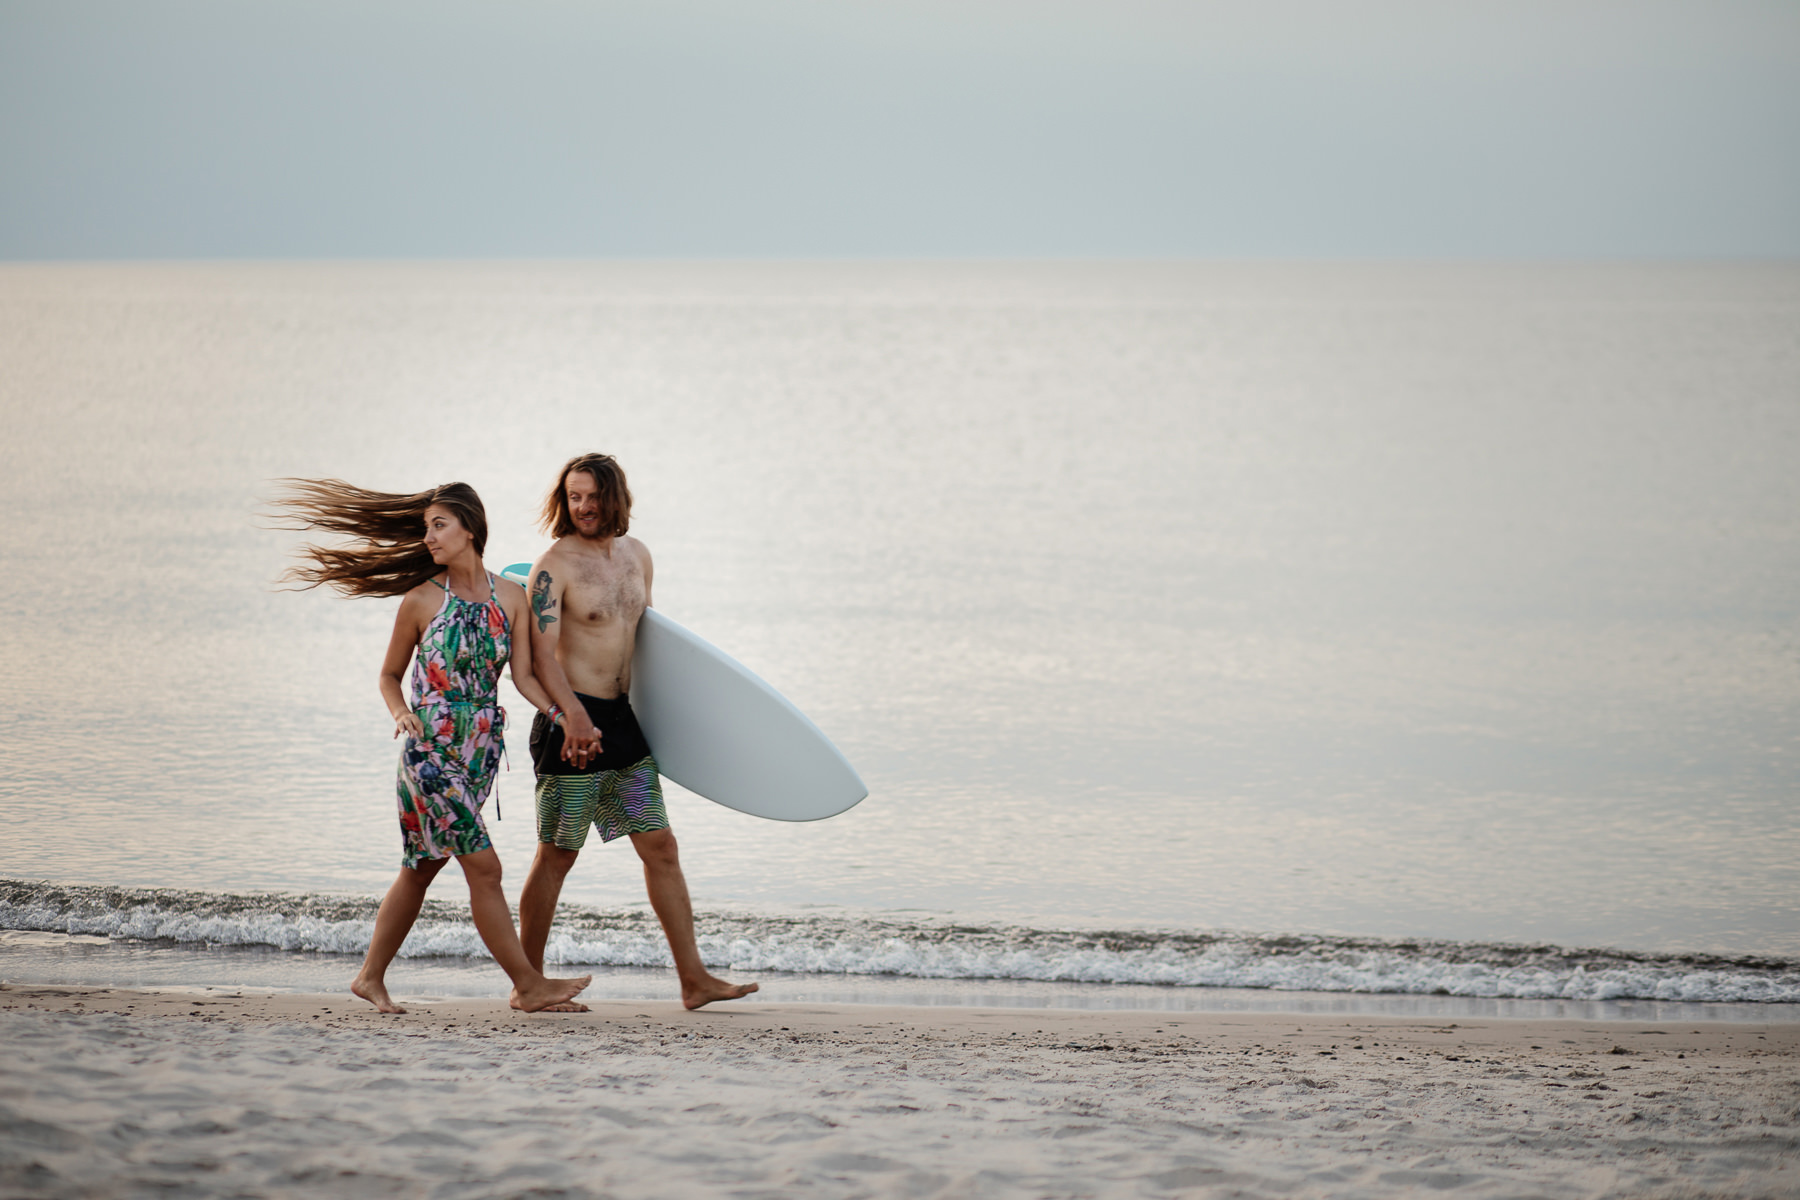 surfing nad bałtykiem